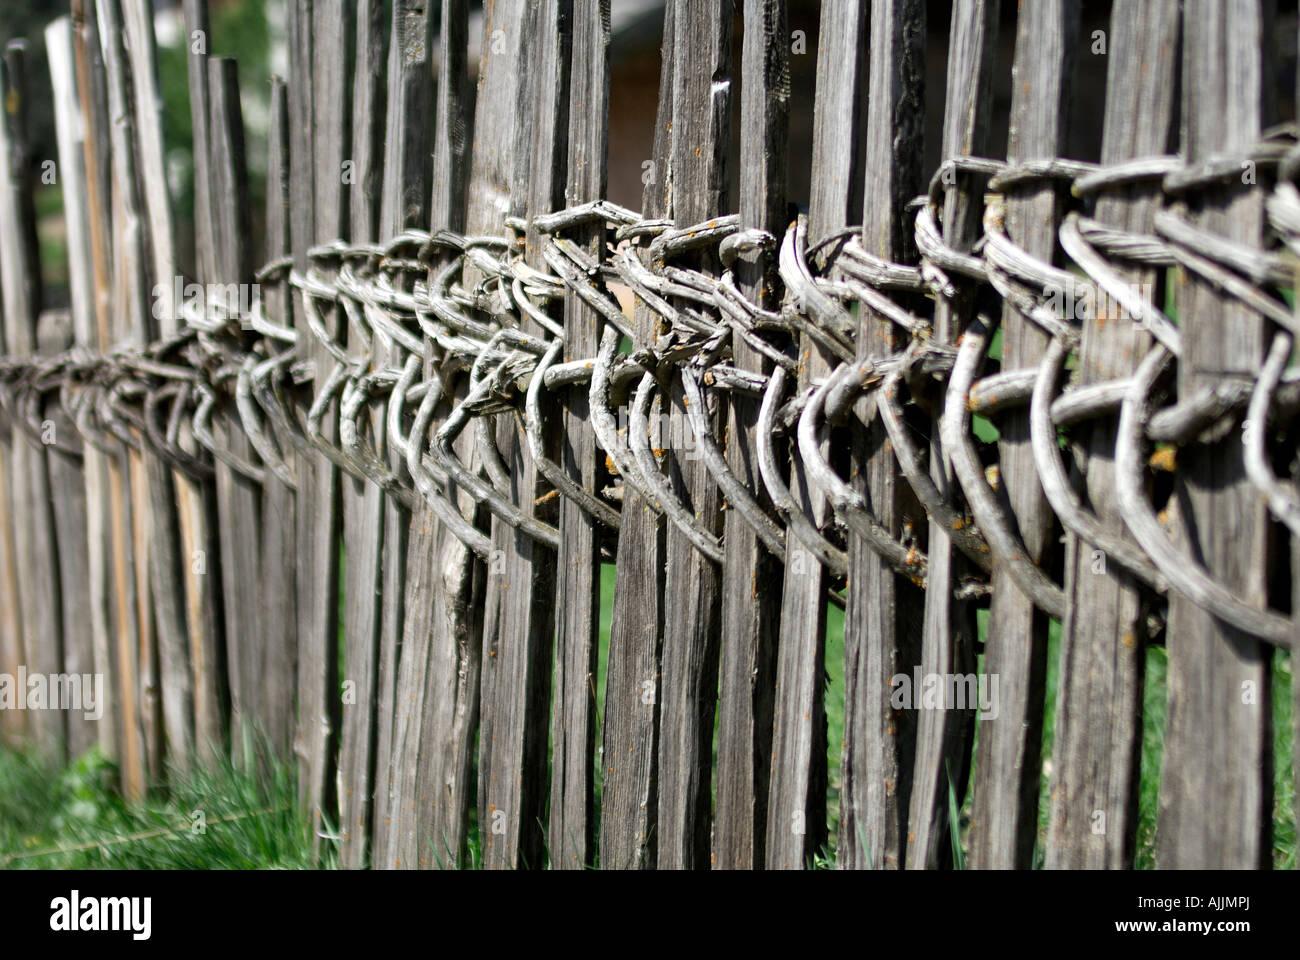 Holzzaun Stockfotos & Holzzaun Bilder Alamy